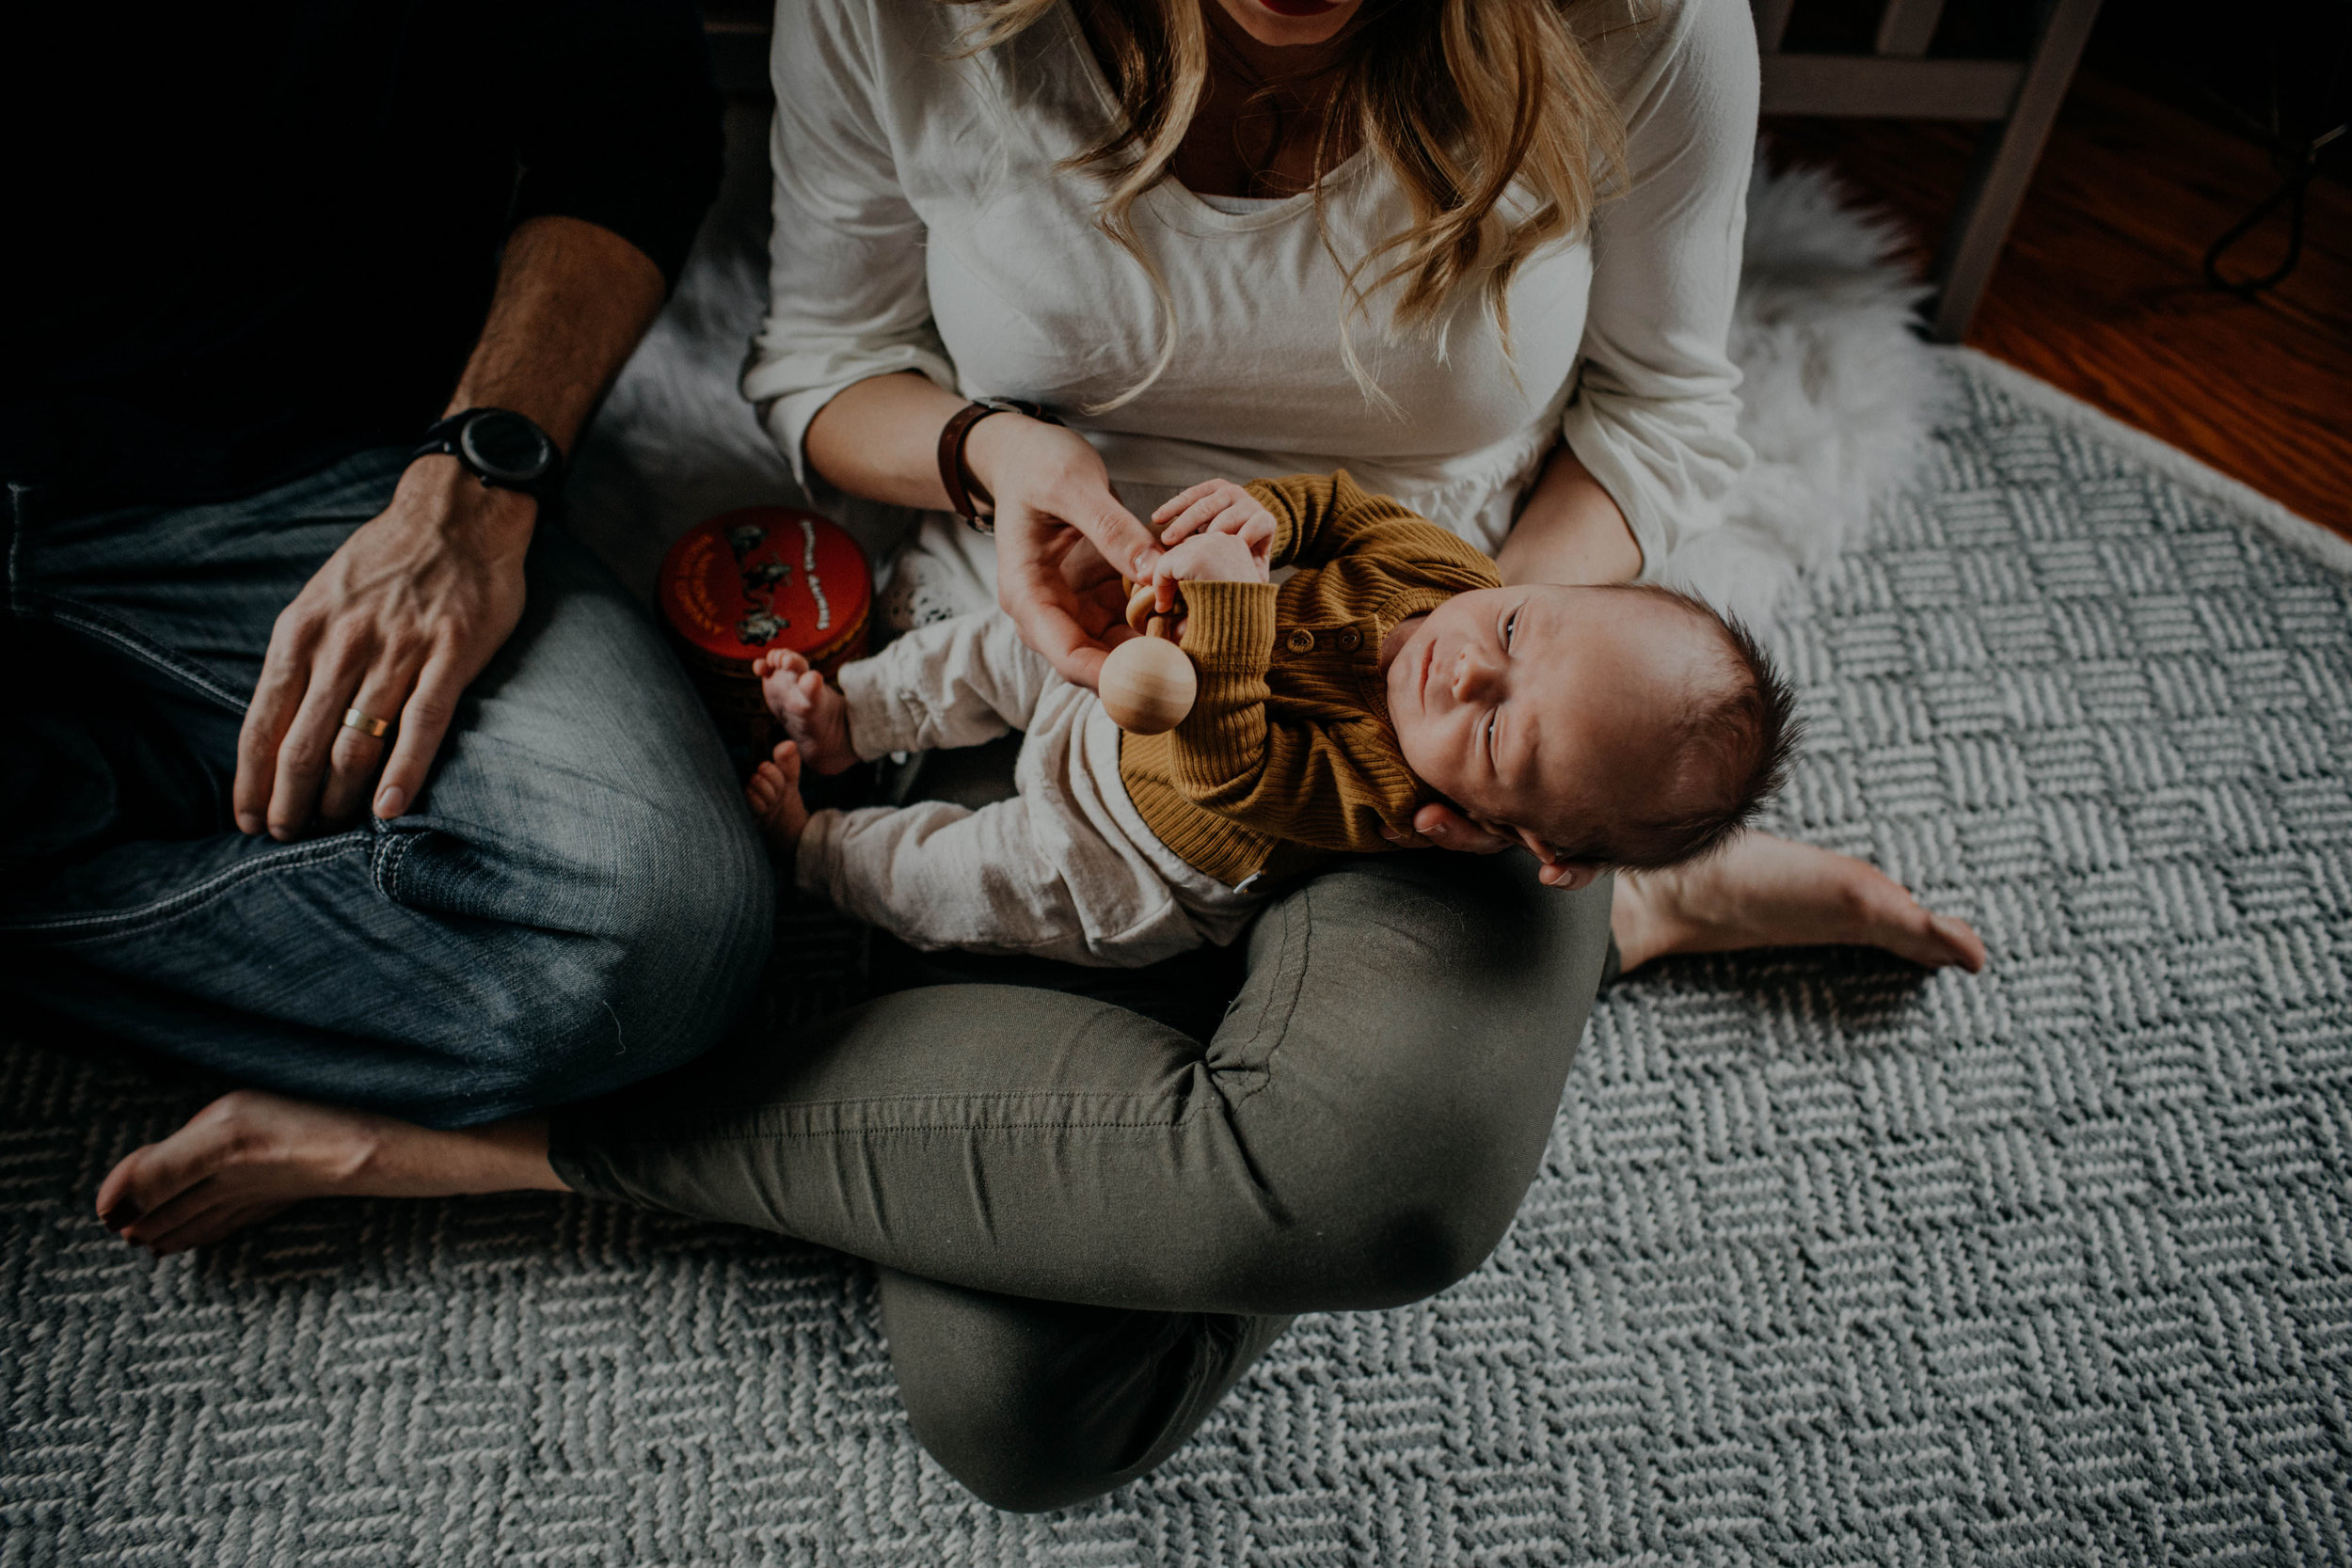 columbus ohio lifestyle family photographer grace e jones photography74.jpg